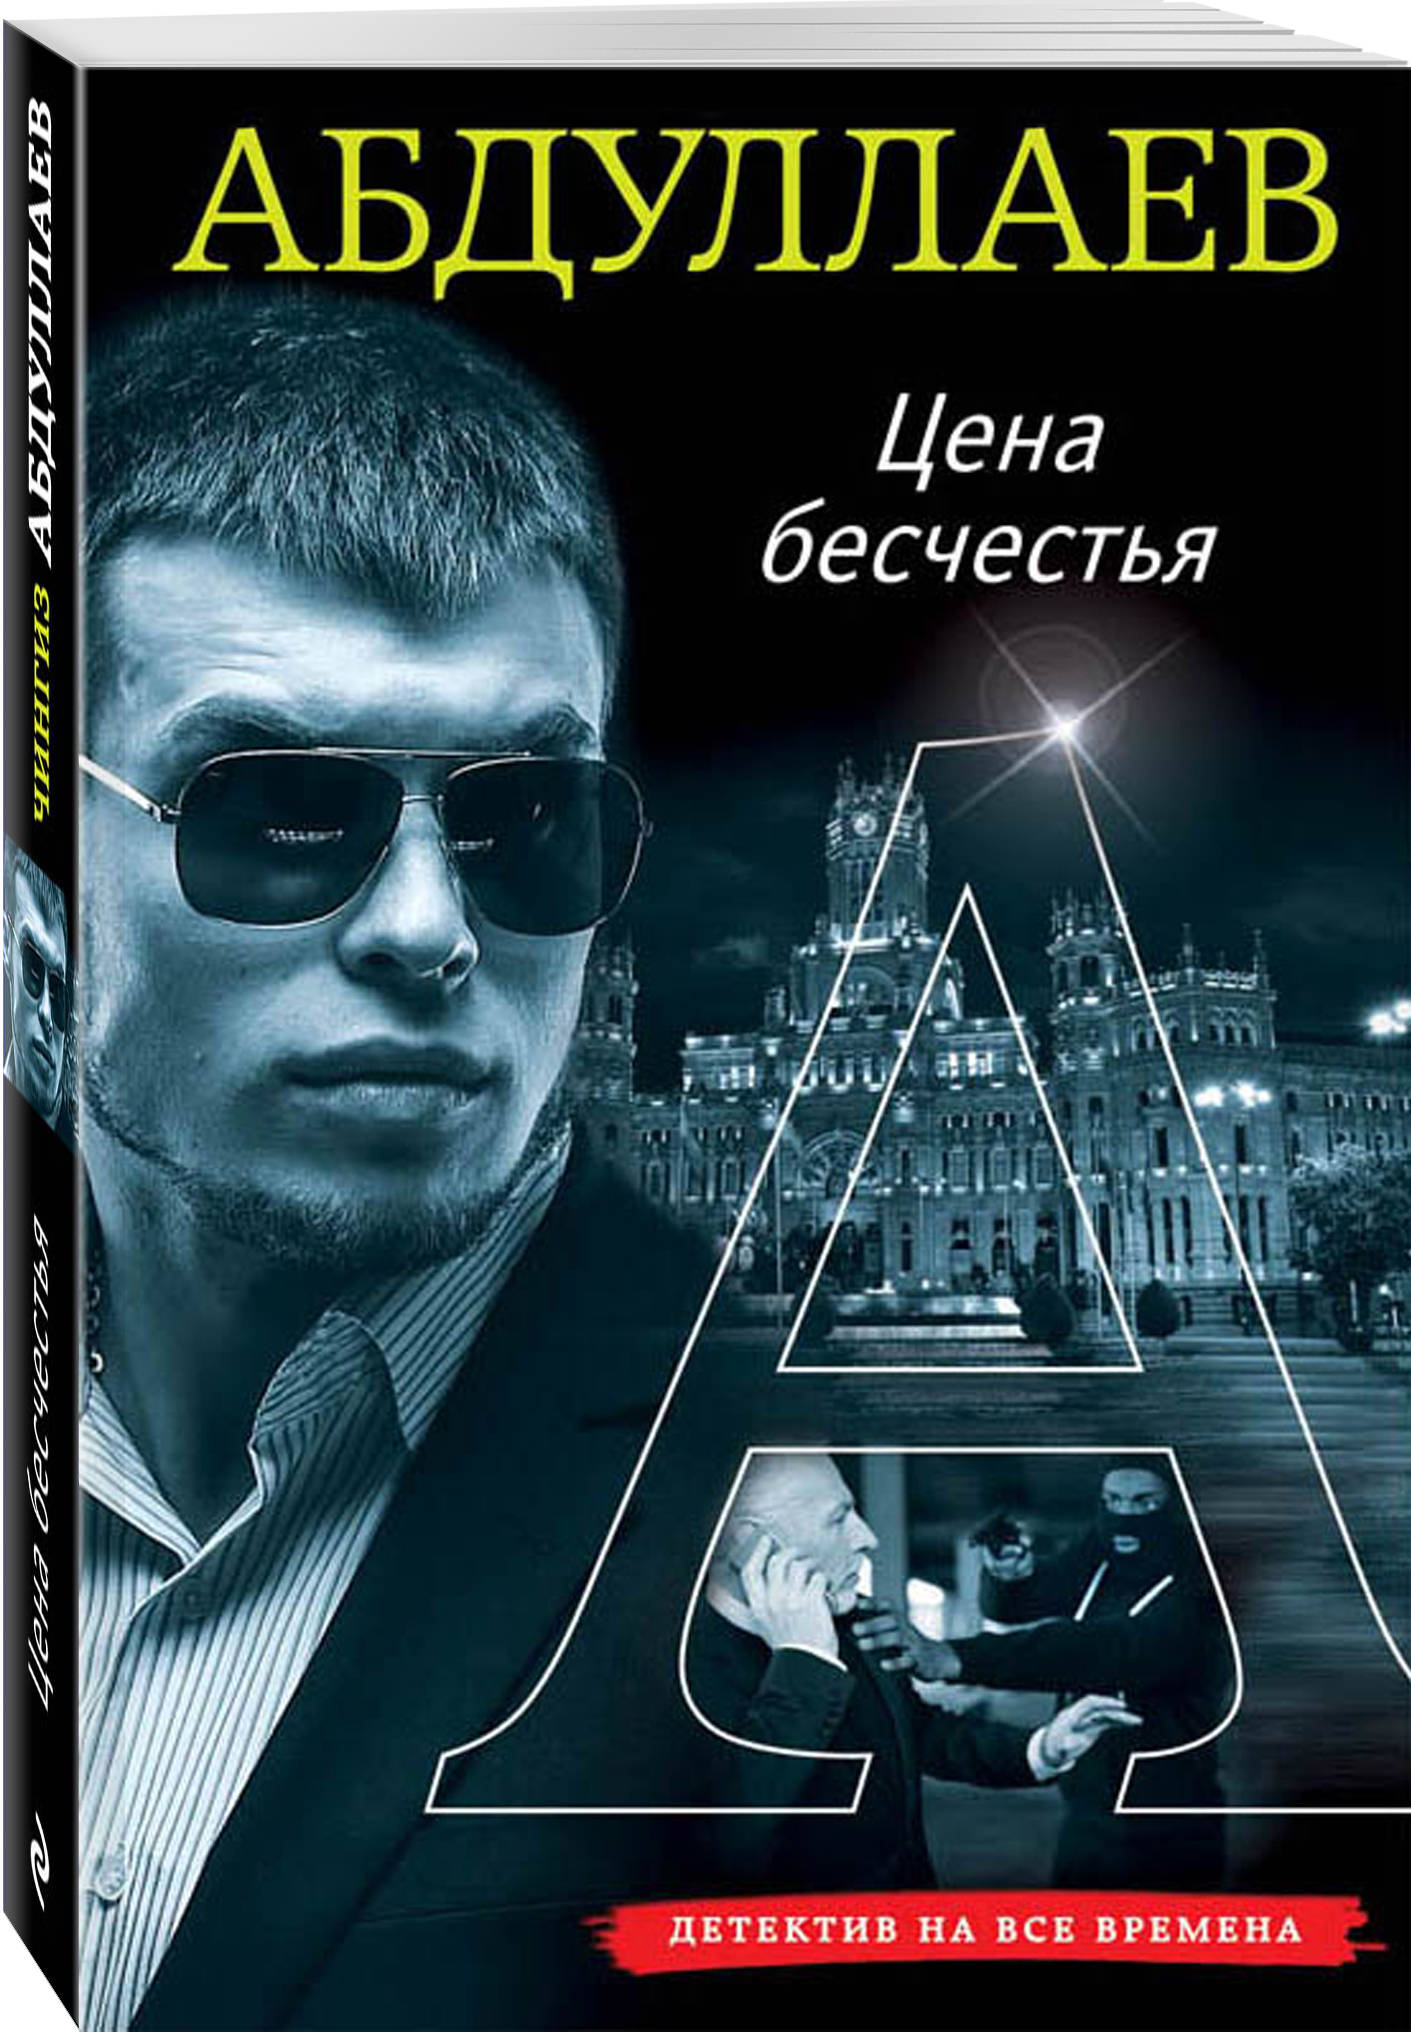 Абдуллаев Ч.А. Цена бесчестия цена бесчестия